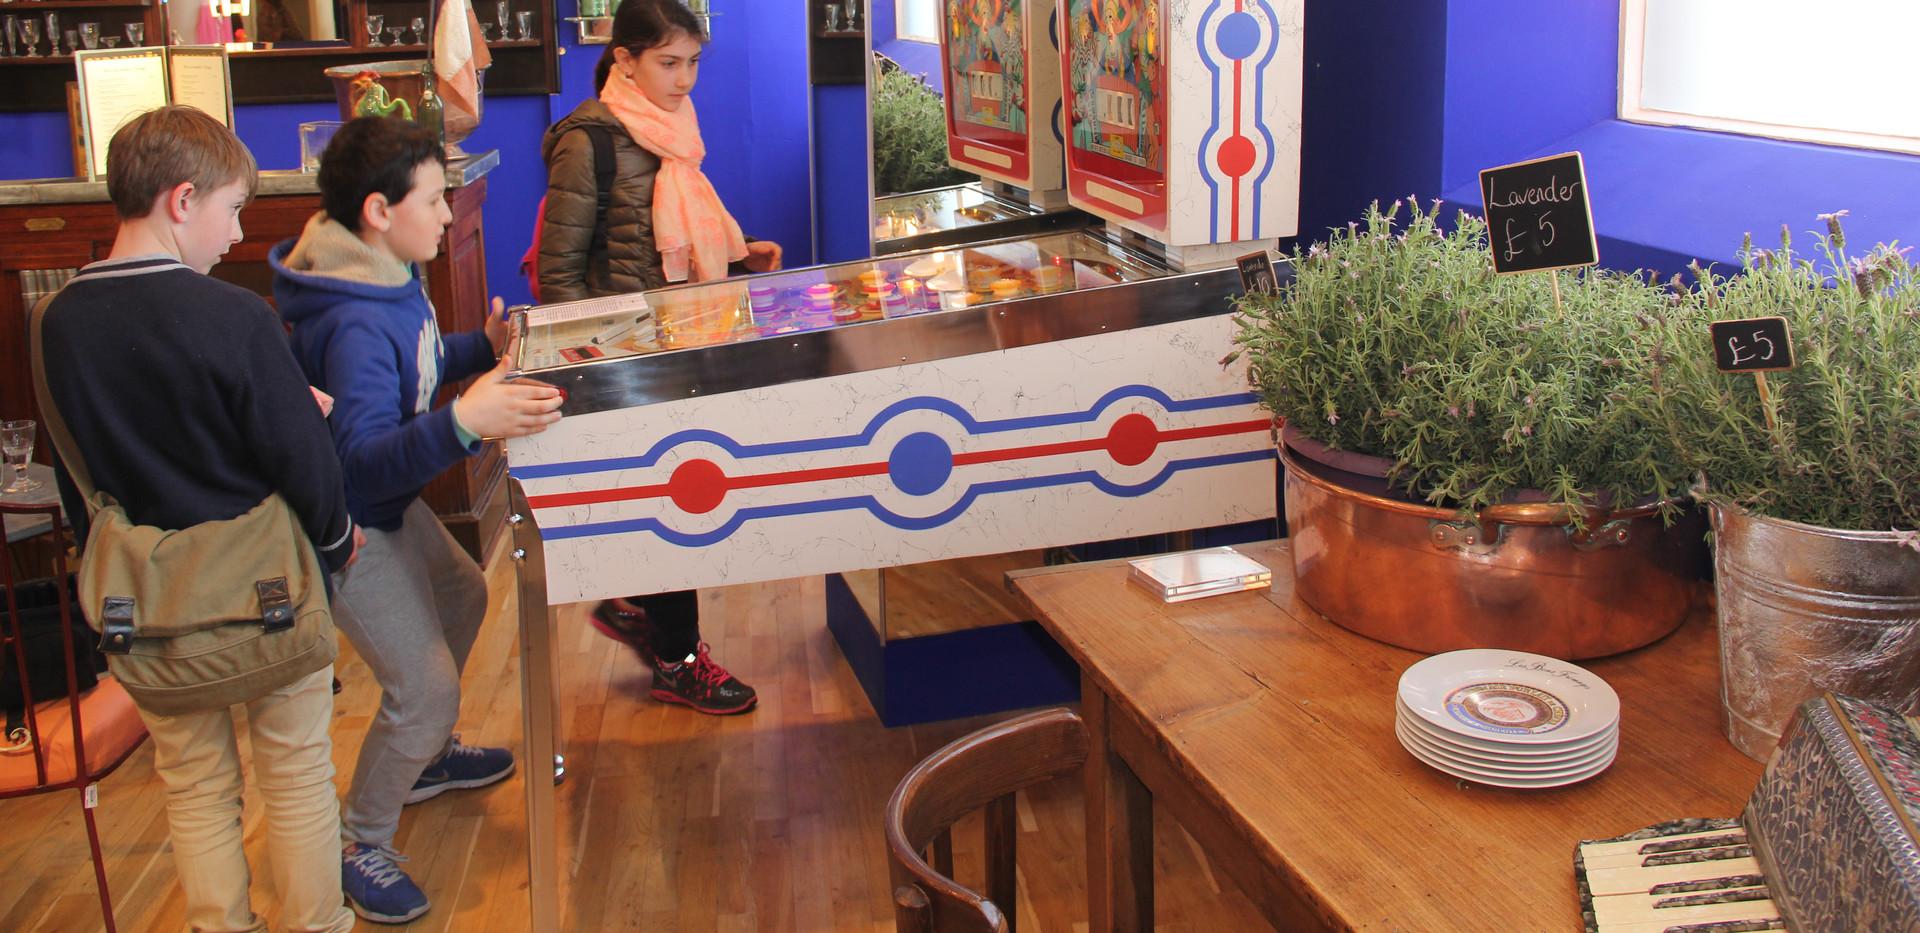 Gottlieb 1964 Gigi at the Conran Shop in Chelsea in 2015